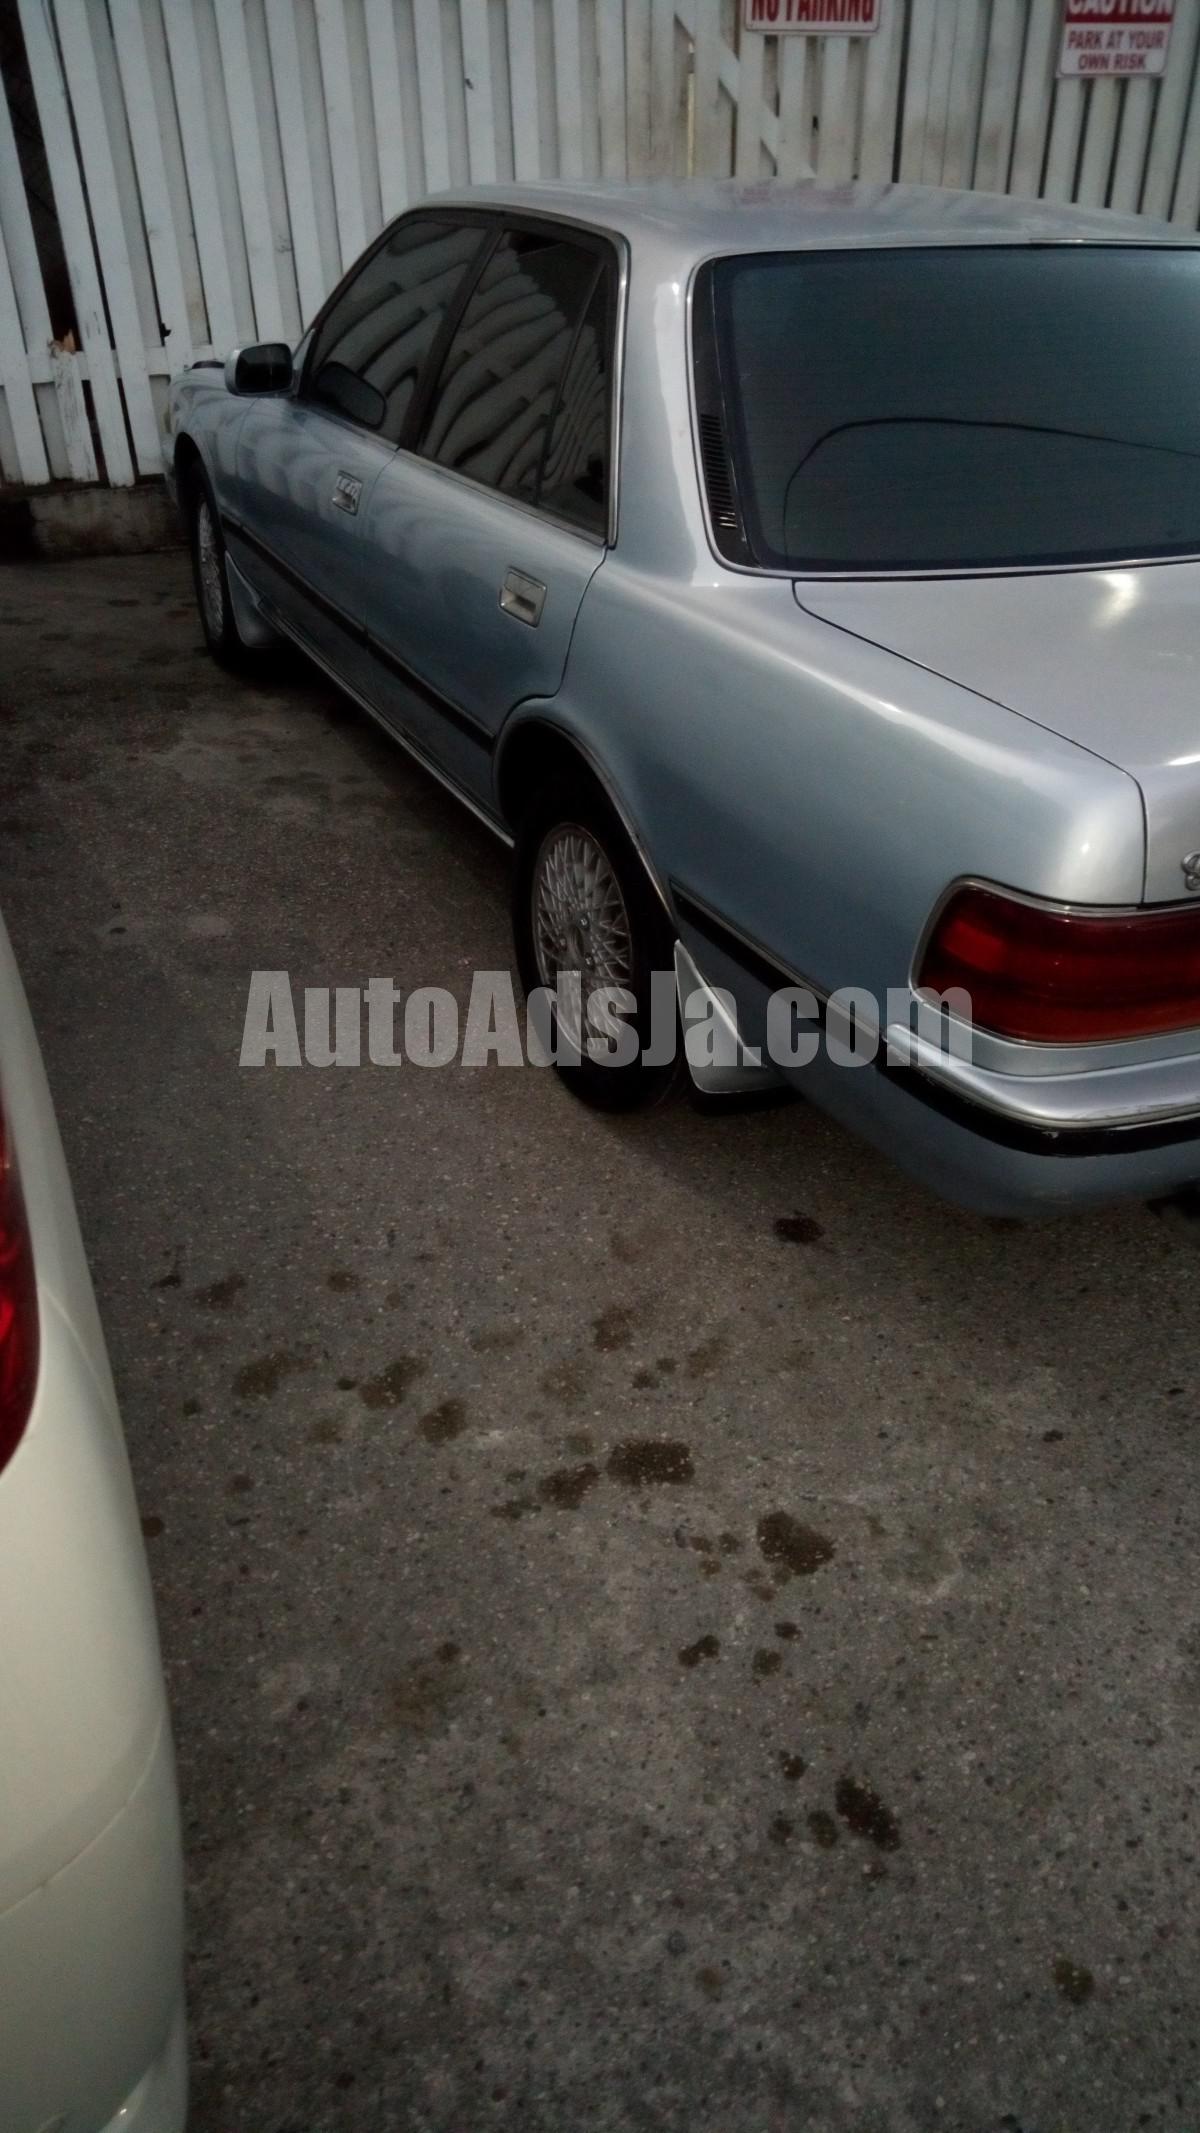 1995 Toyota Mark 2 Grande For Sale In St Ann Jamaica Autoadsja Com